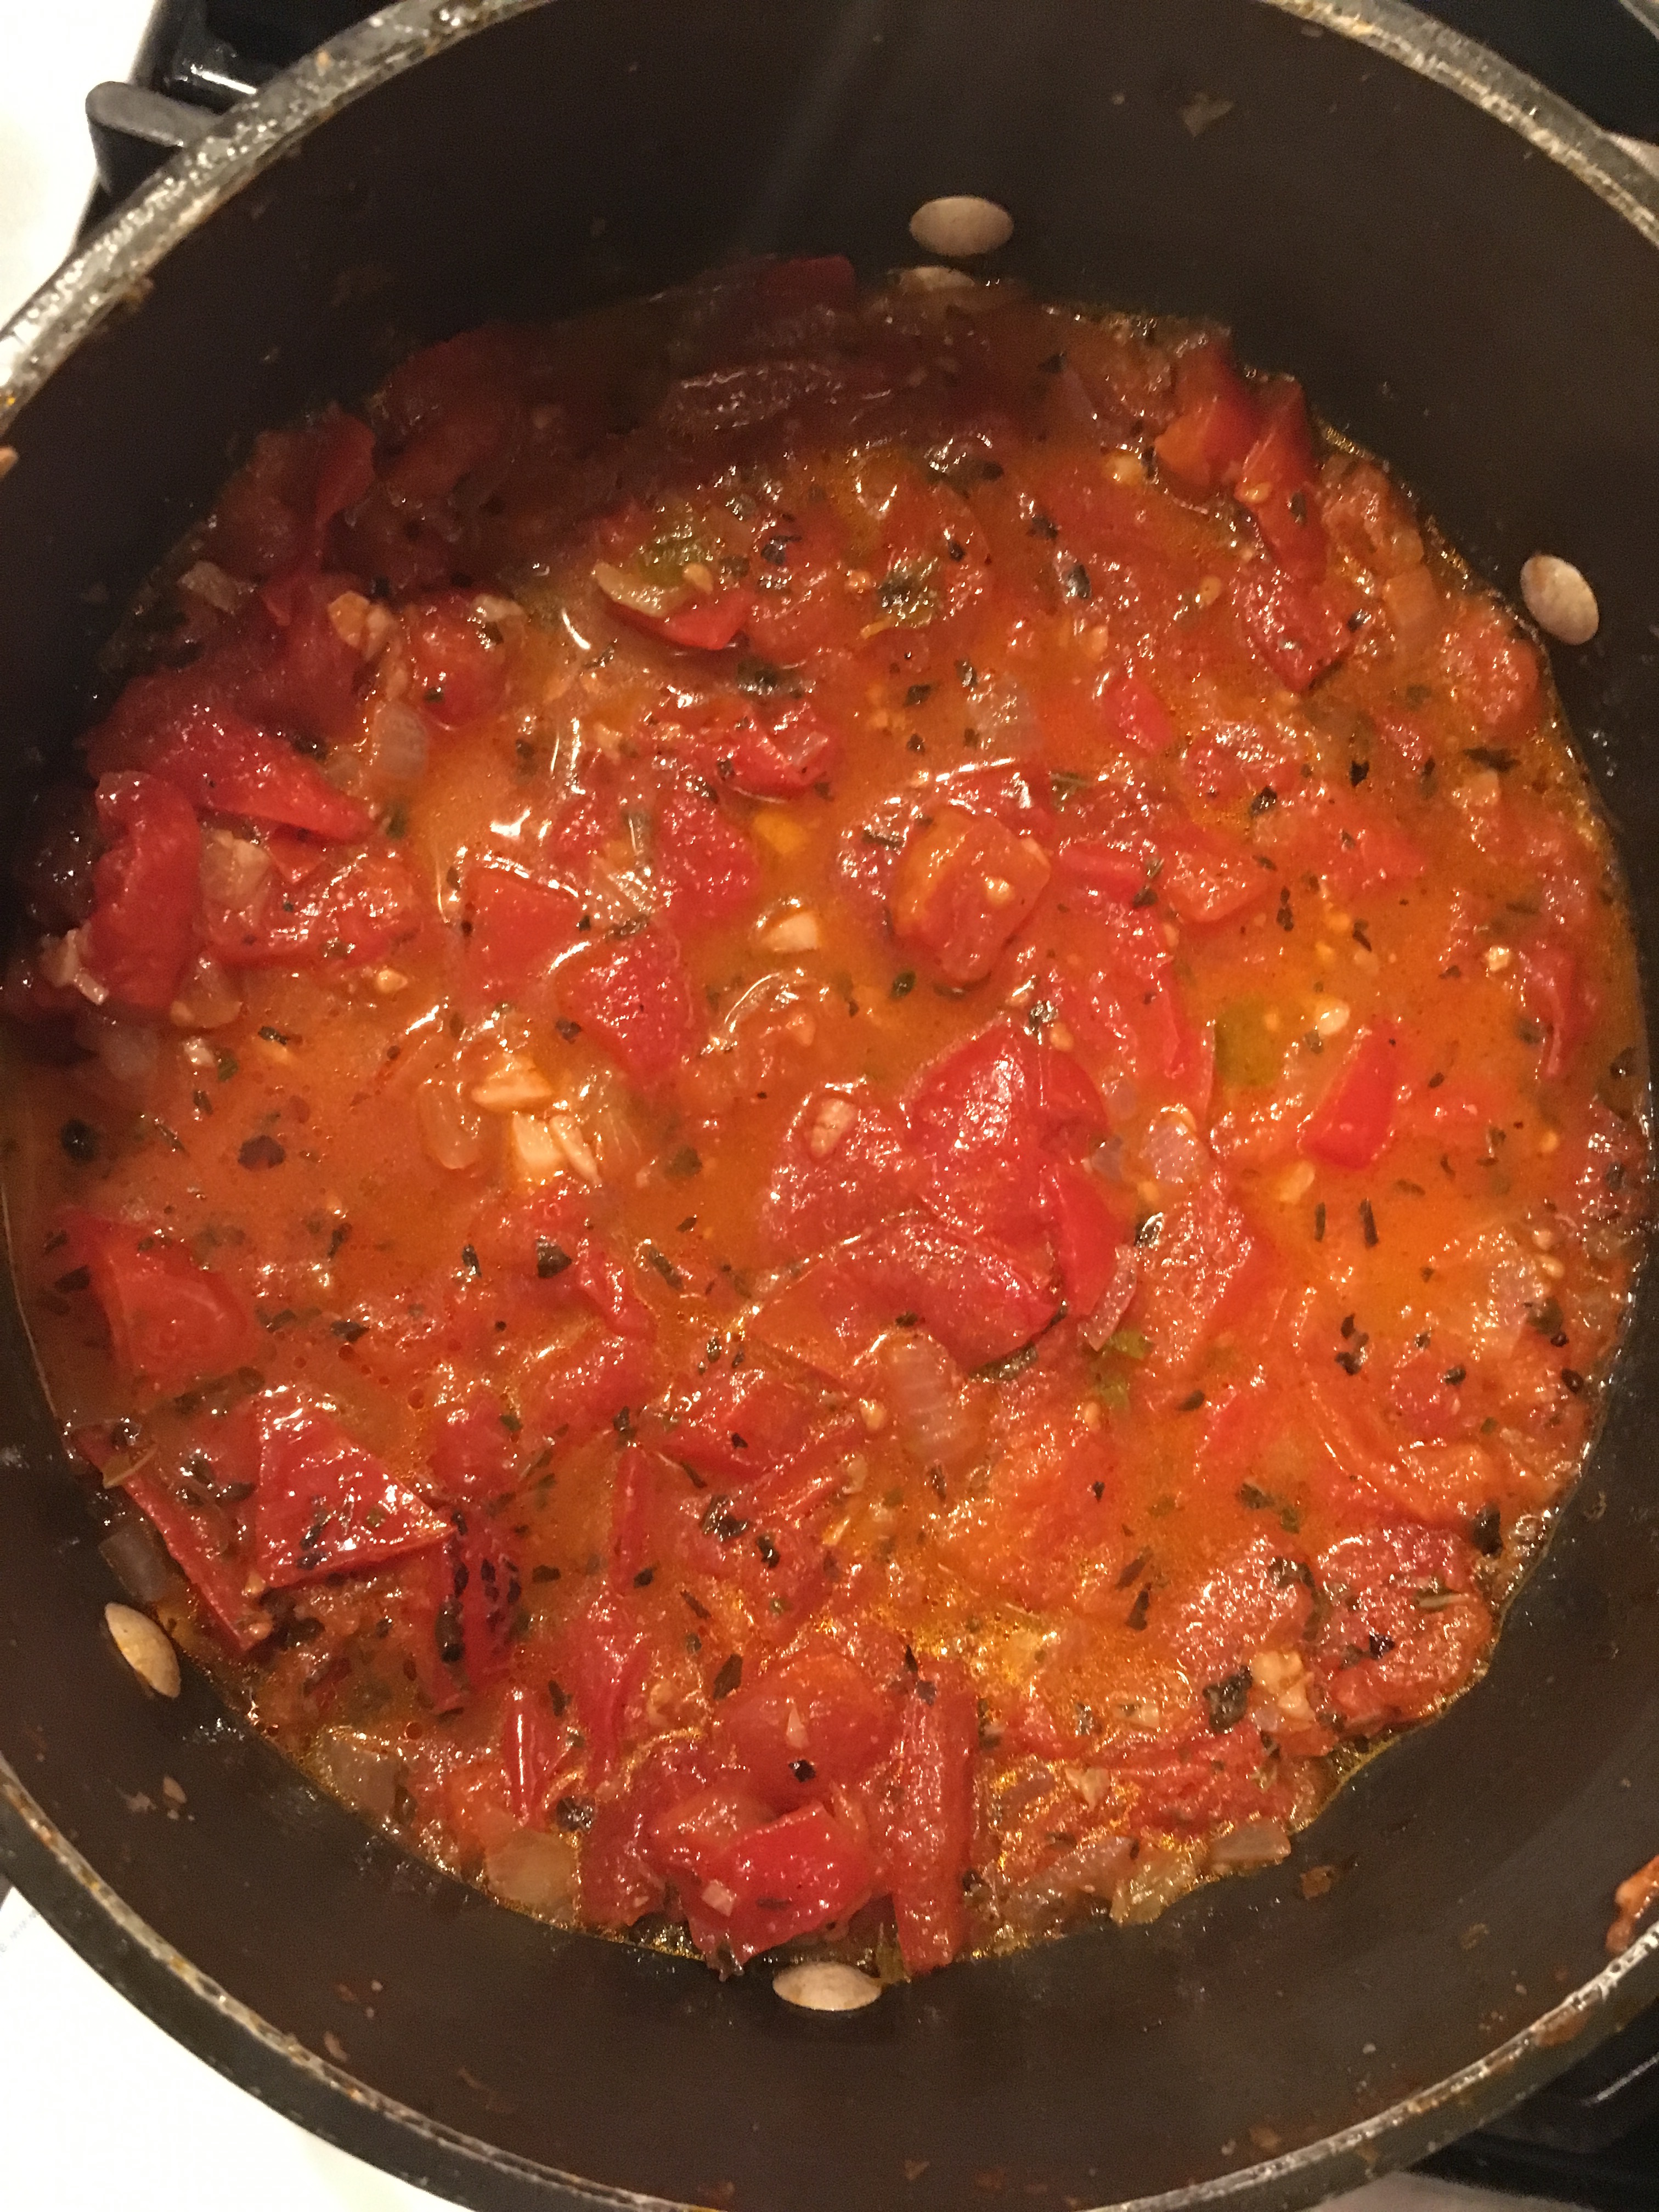 Fresh Tomato Marinara Sauce CookingIsArt